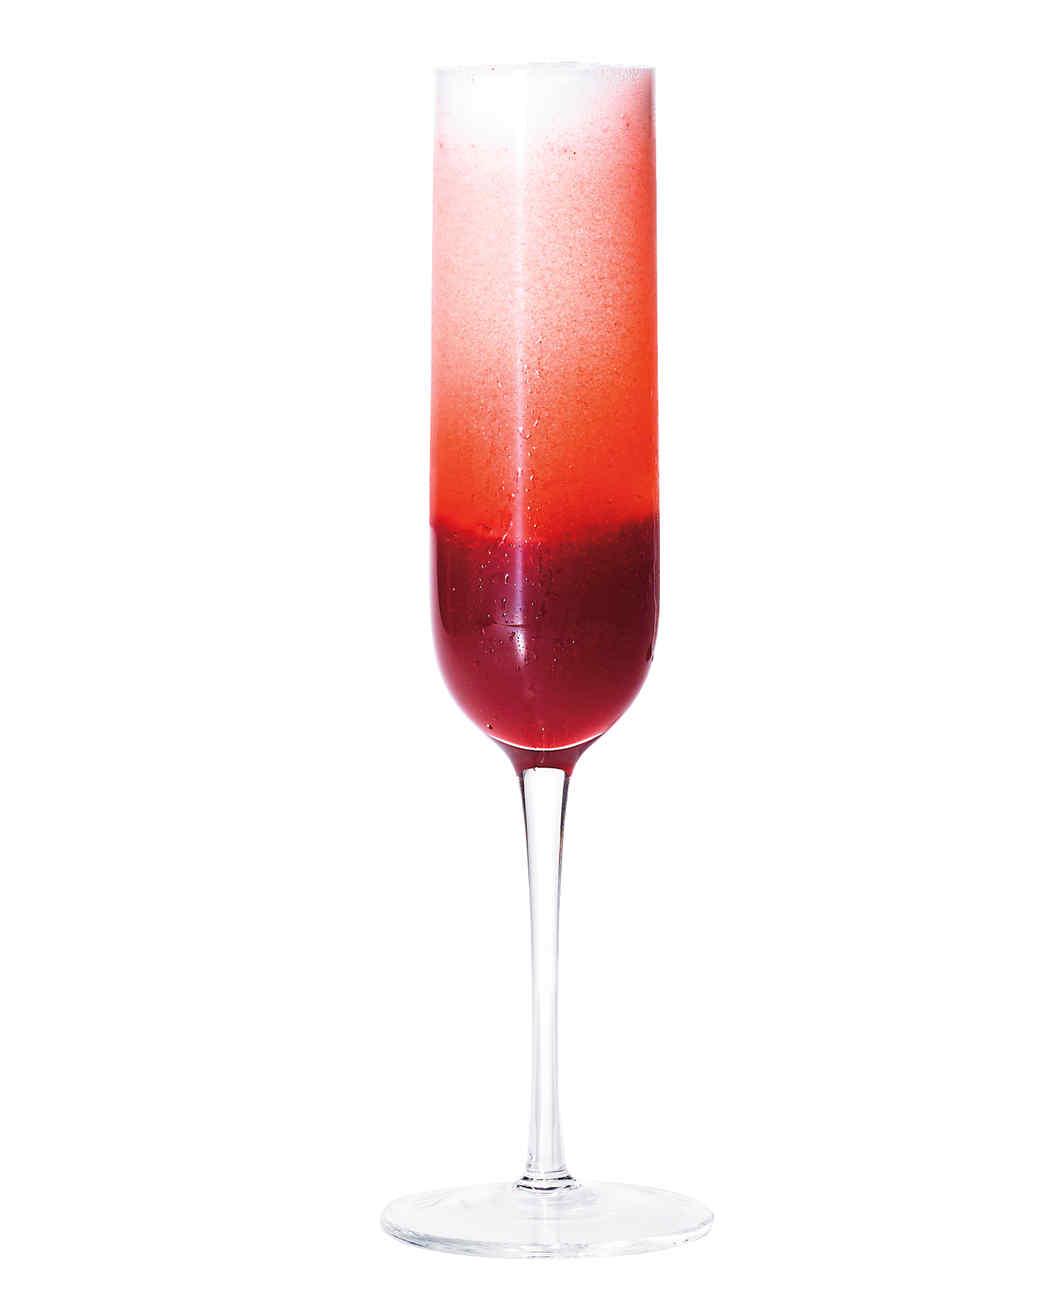 cranberry-cocktail-193-d111491.jpg